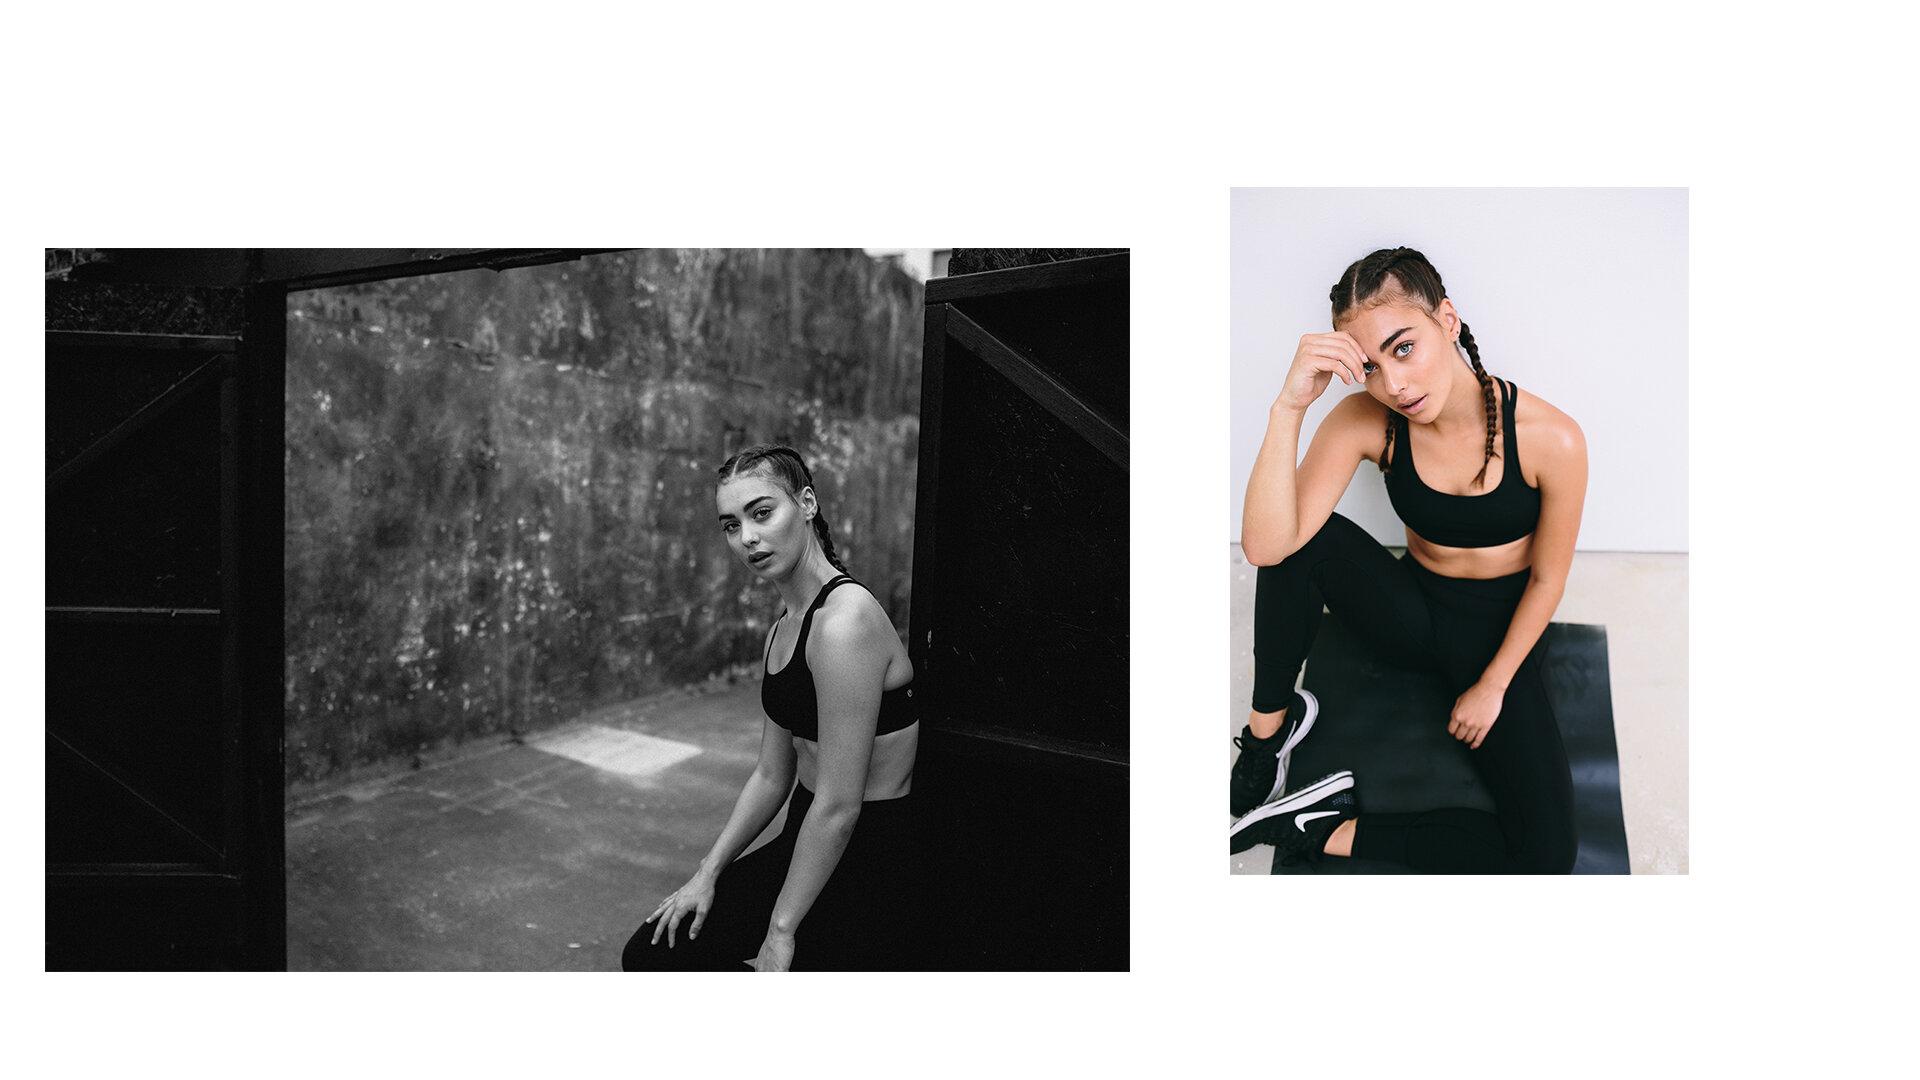 toby-butler-tobybutlerphoto-photography-fitness-lifestyle-lifestylephotographer-london-city-body-lululemon-yoga-stretch-emotion-physical-8.jpg